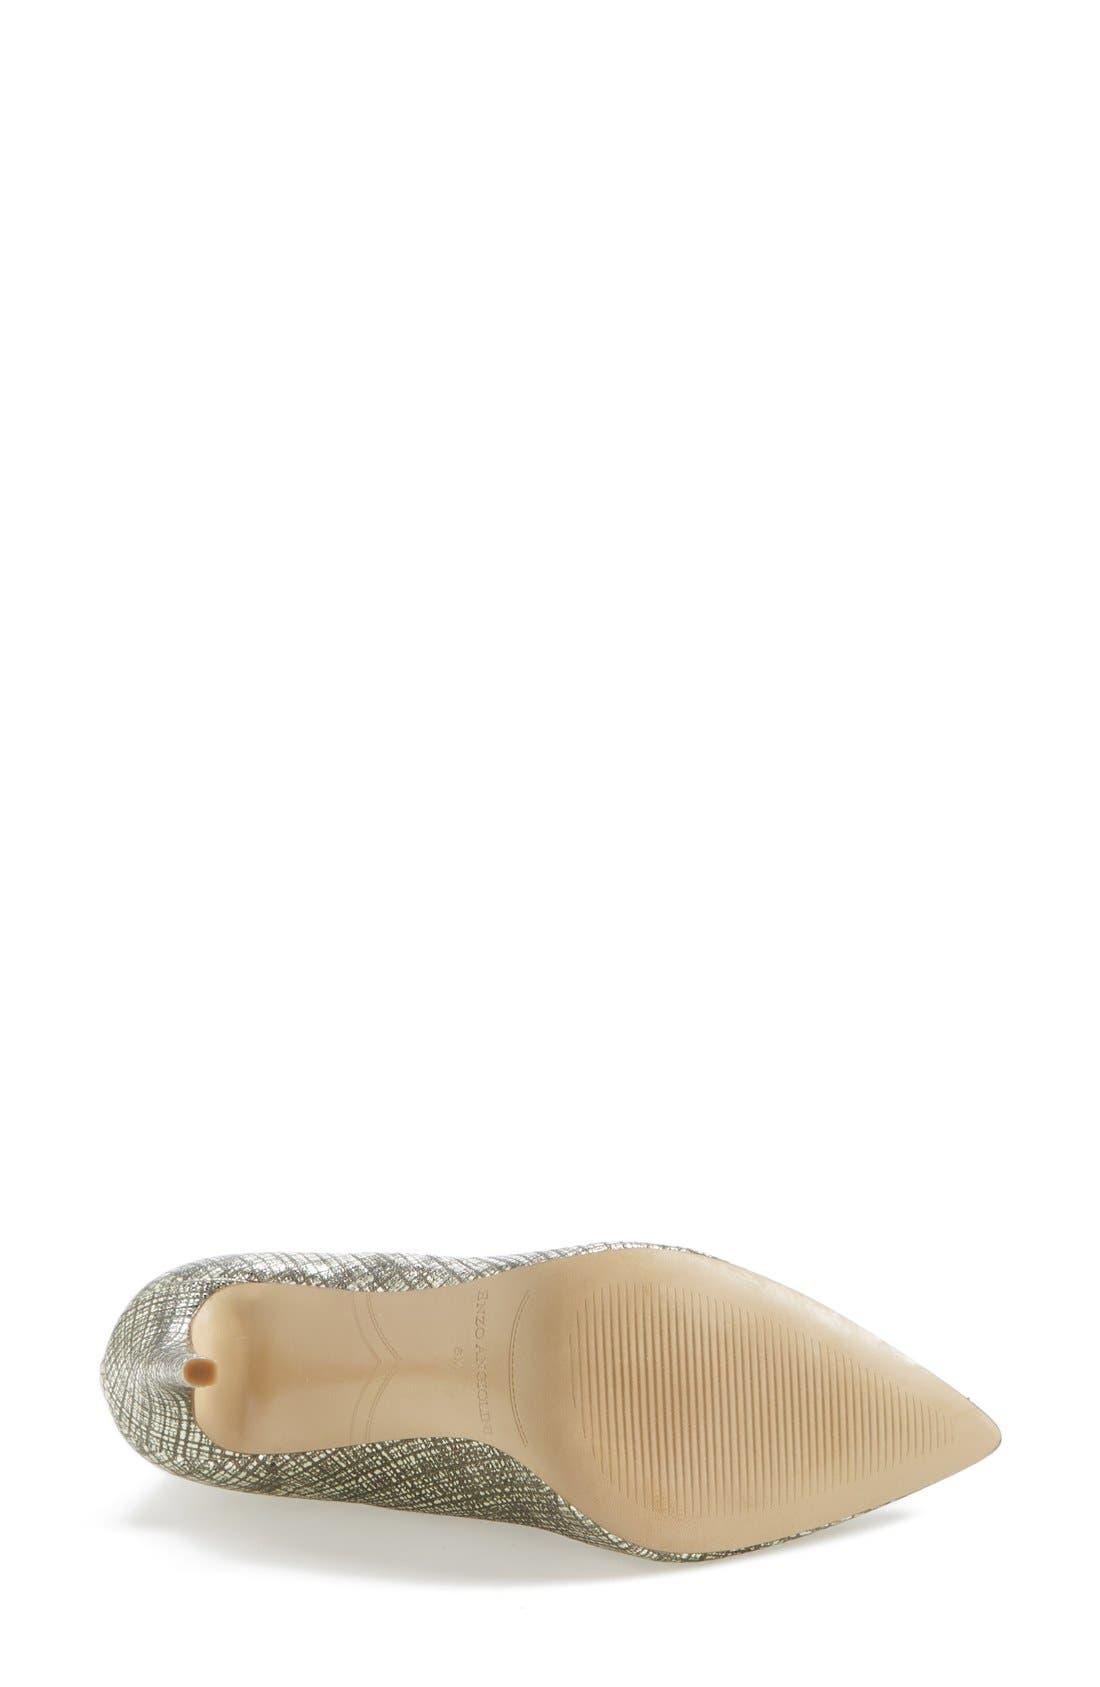 Alternate Image 3  - Enzo Angiolini 'Finton' Leather Pointy Toe Pump (Women)